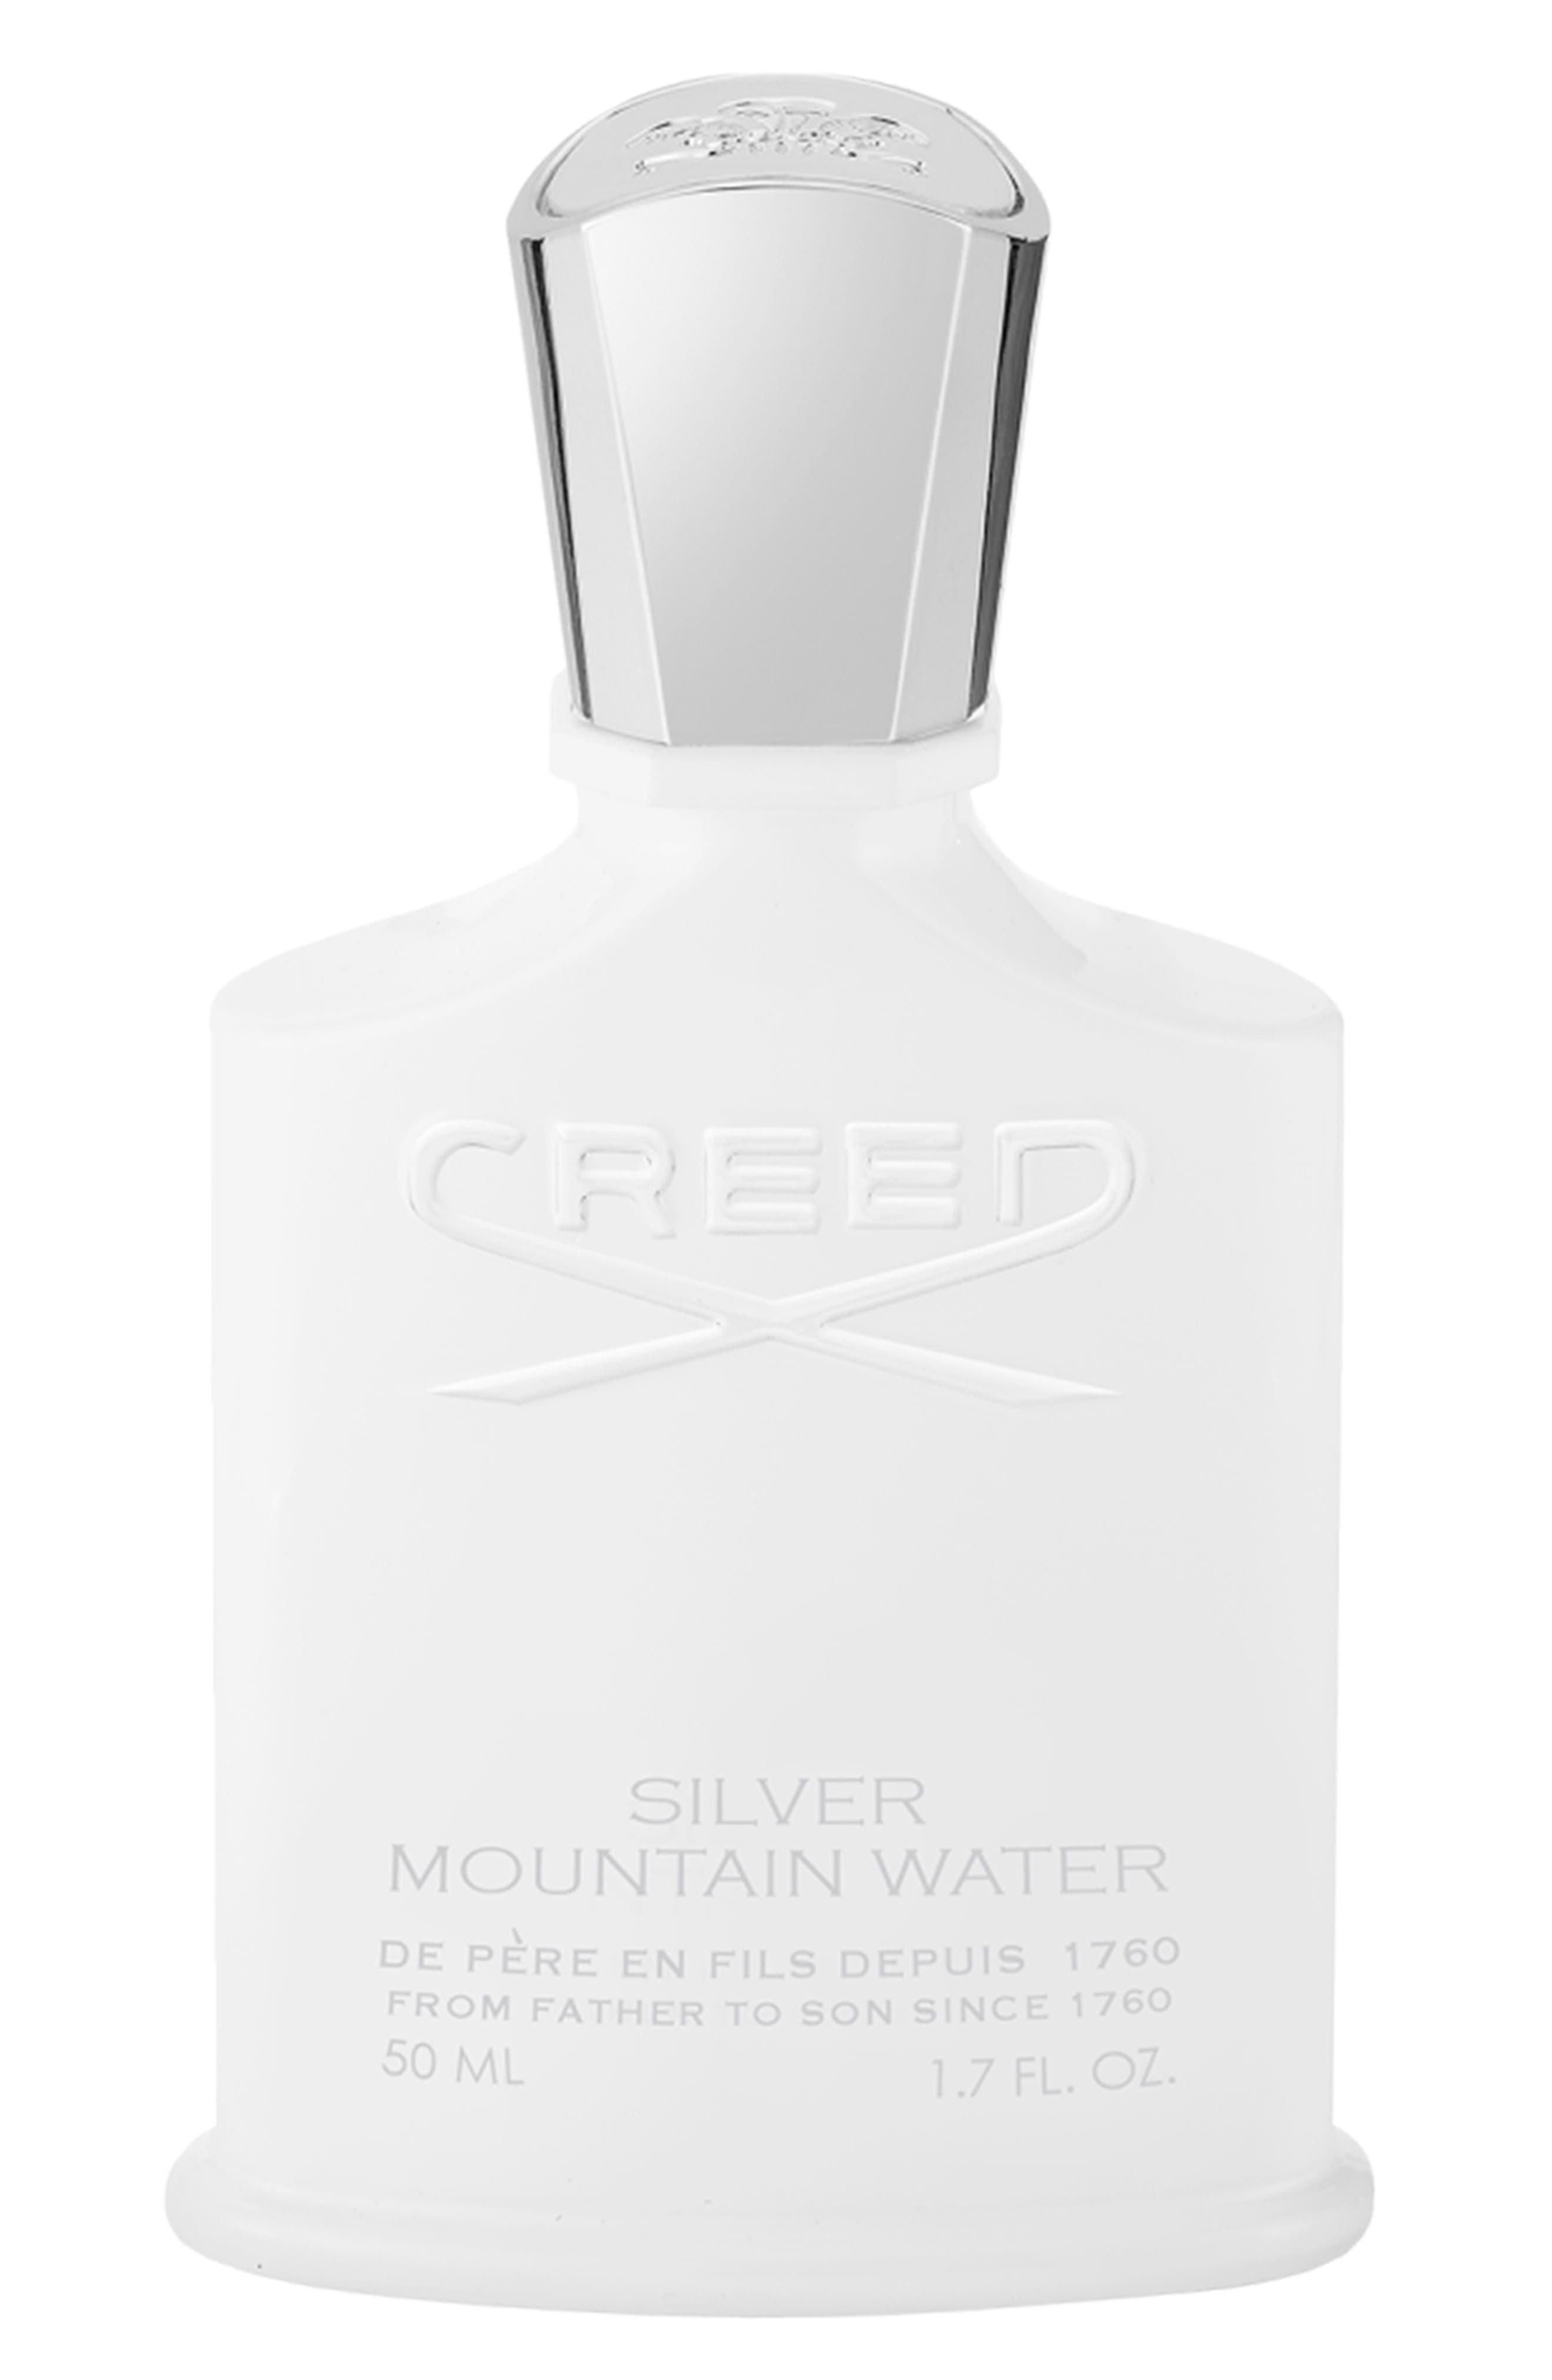 Silver Mountain Water Fragrance